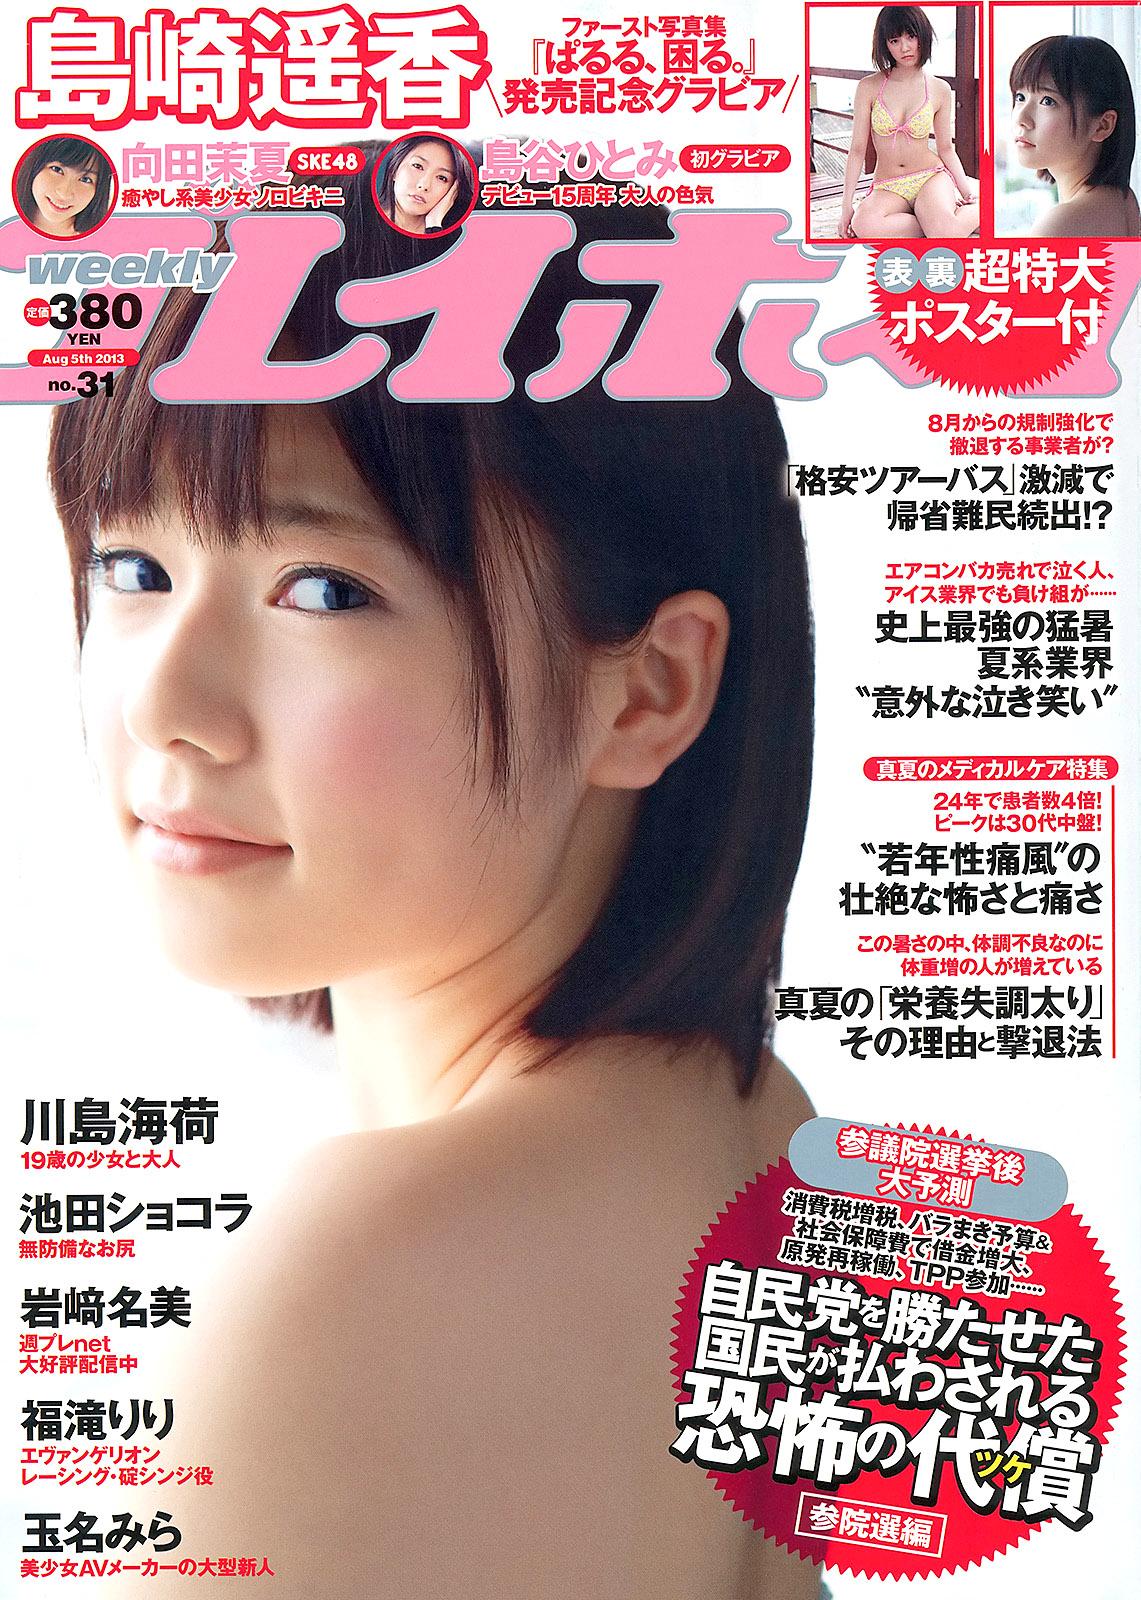 HShimazaki WPB 130805 01.jpg